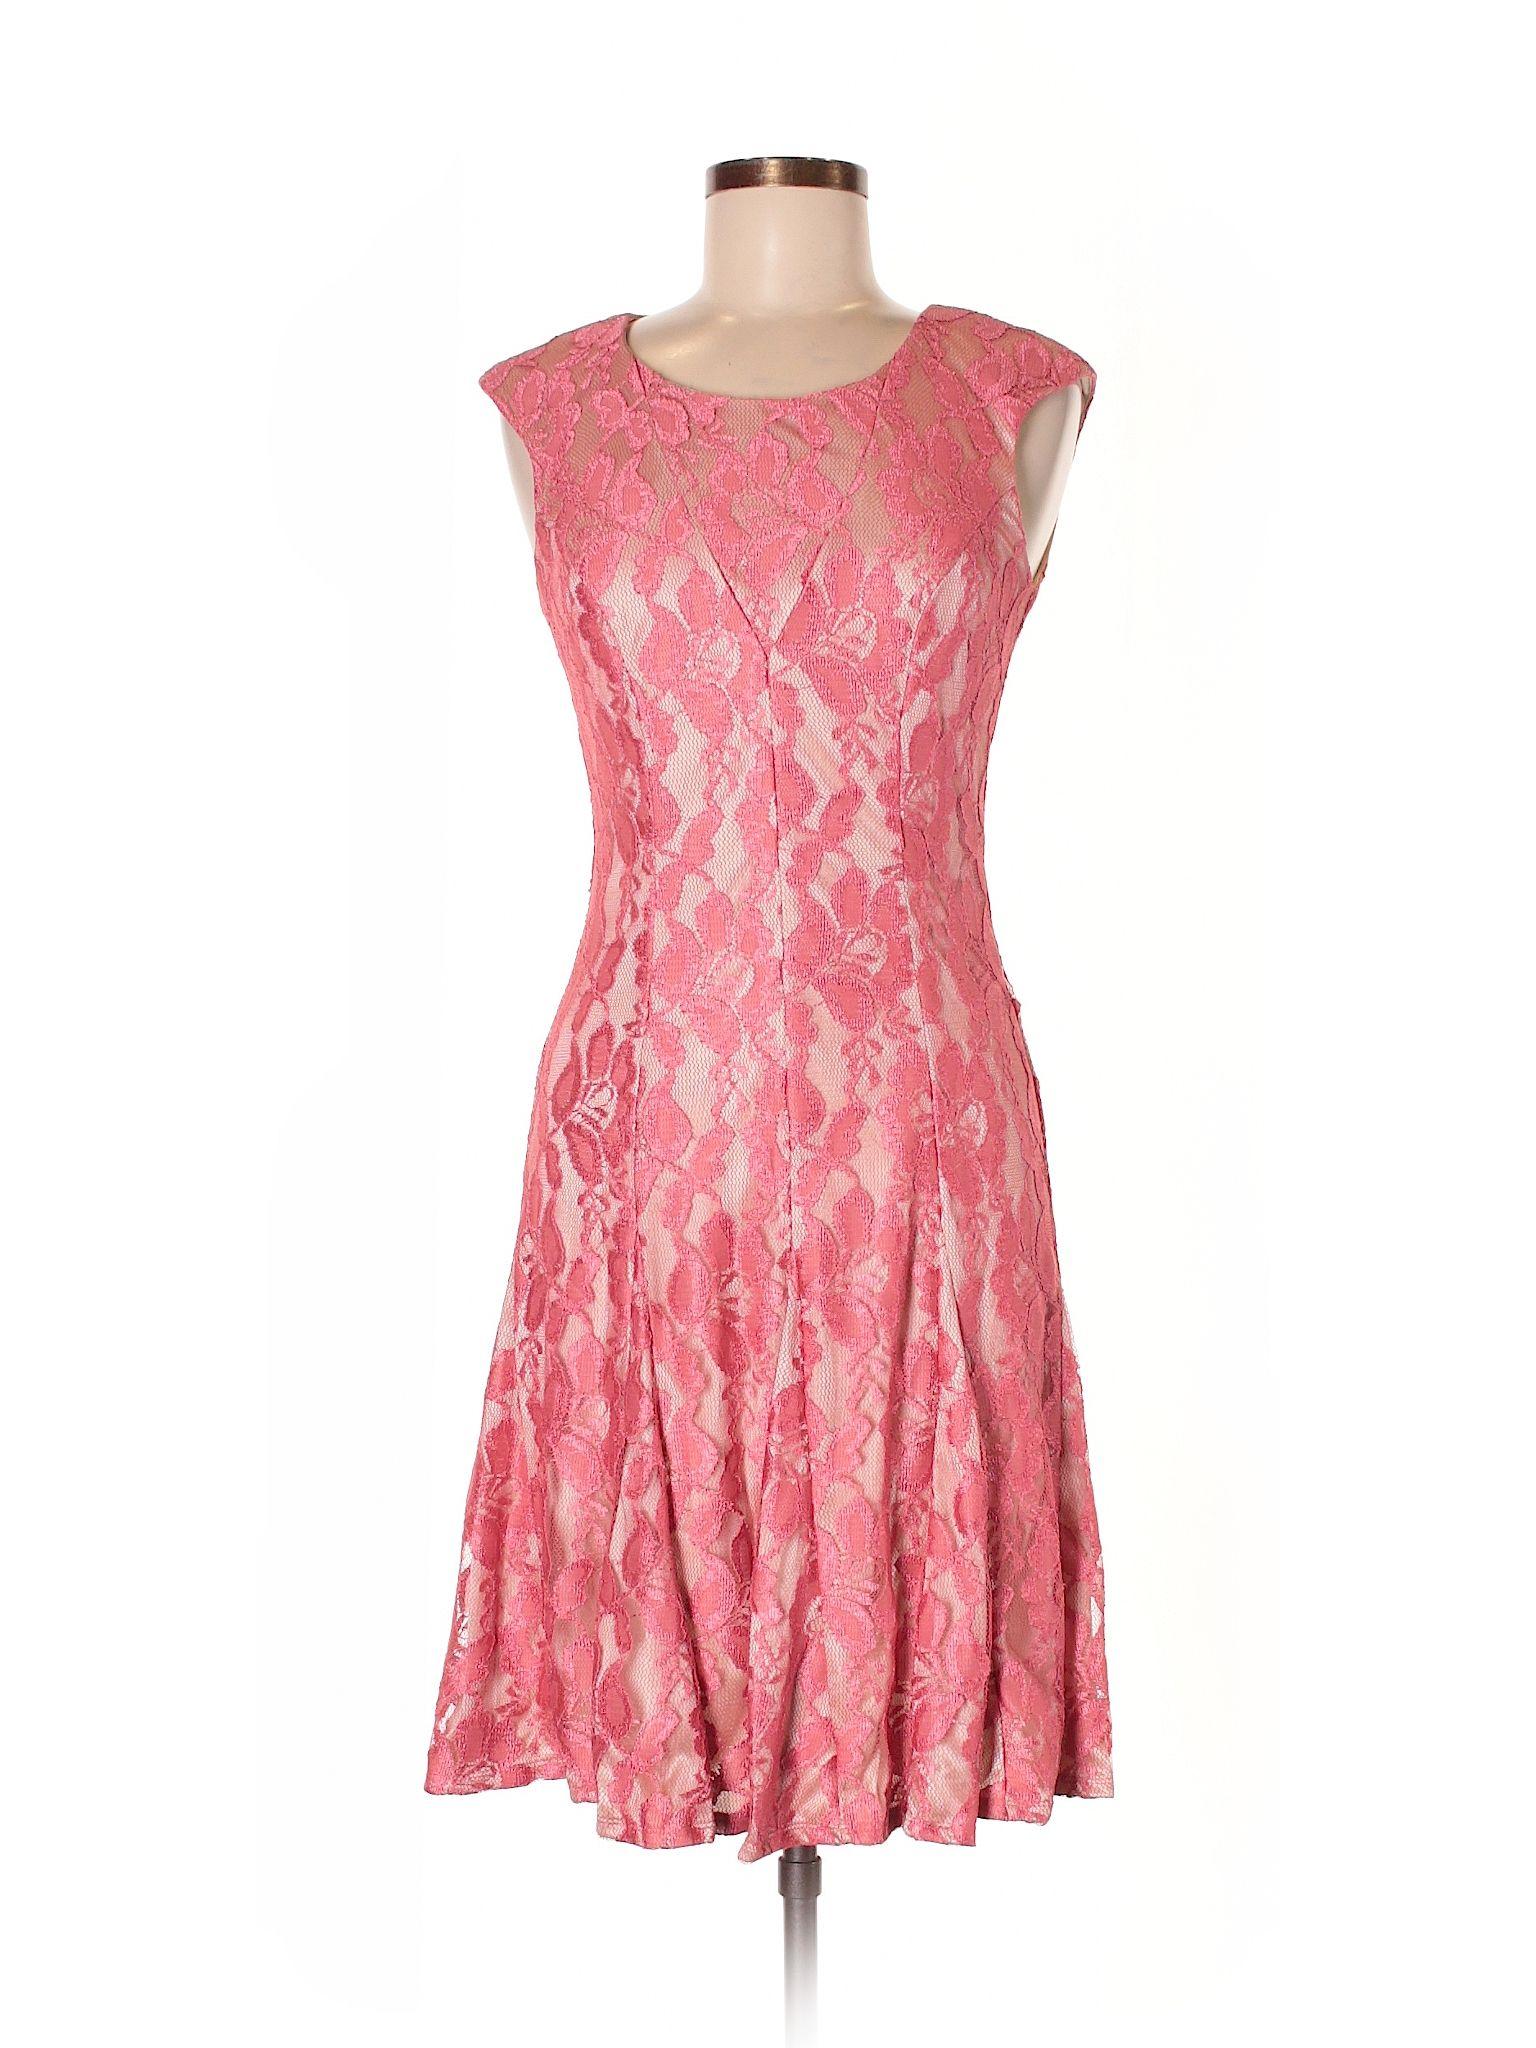 ca7807ec6150d Casual Dress | Products | Dresses, Dress barn dresses, Dress outfits